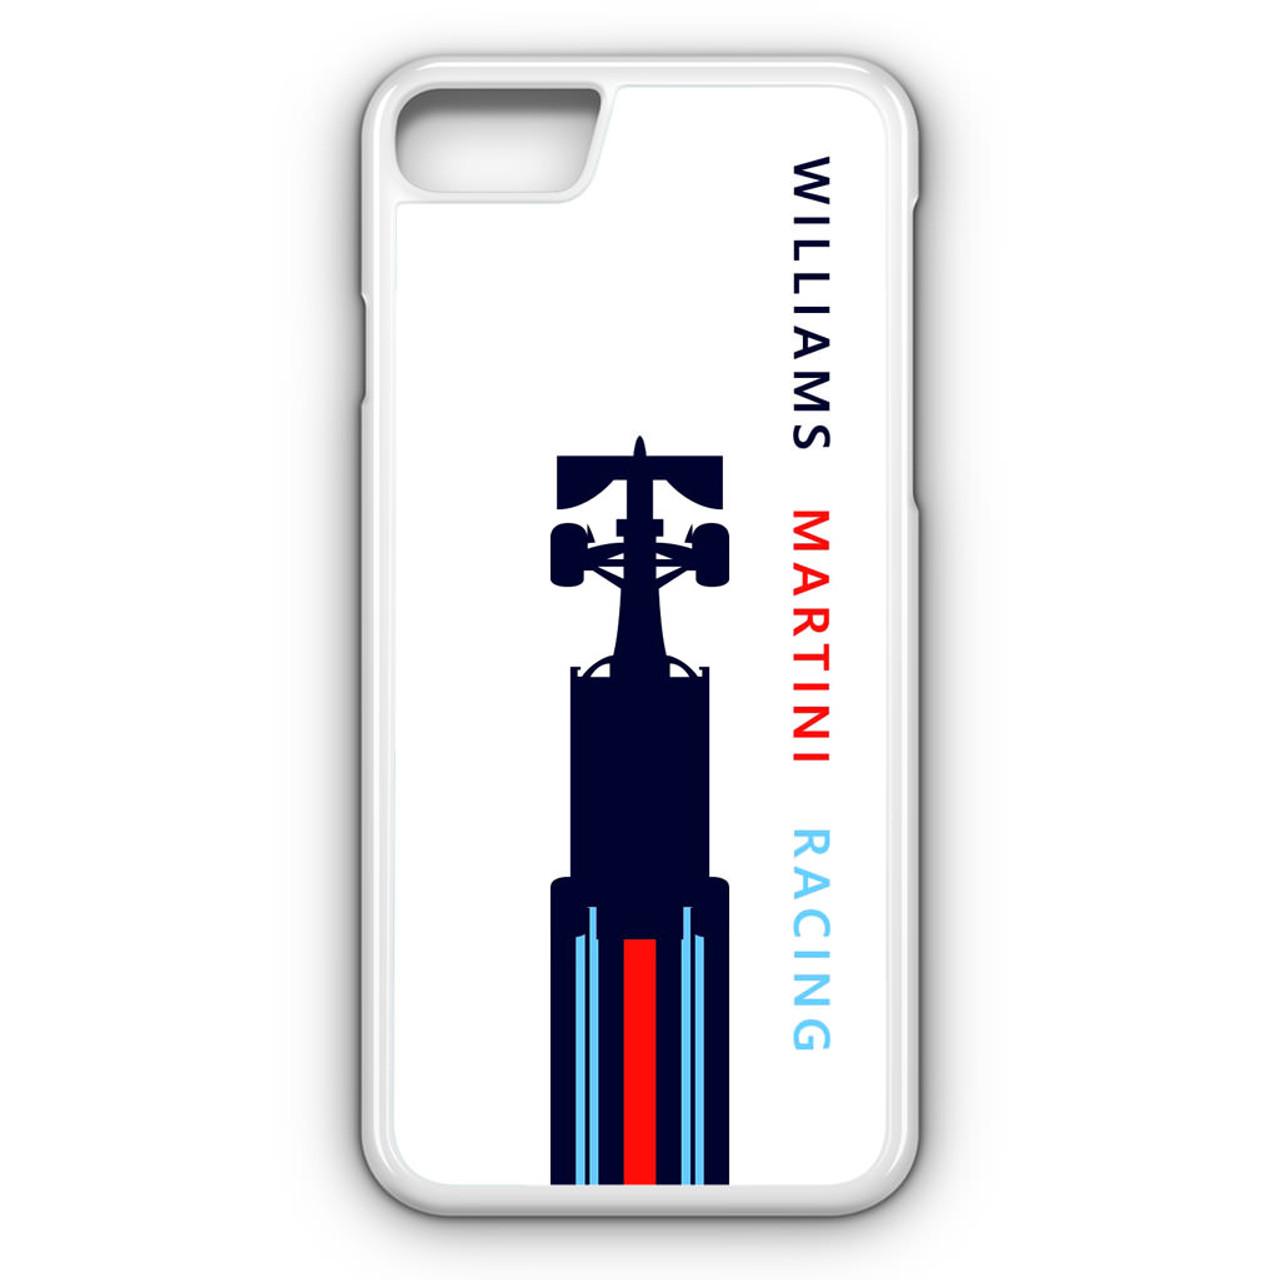 Williams Martini Racing Logo iphone case